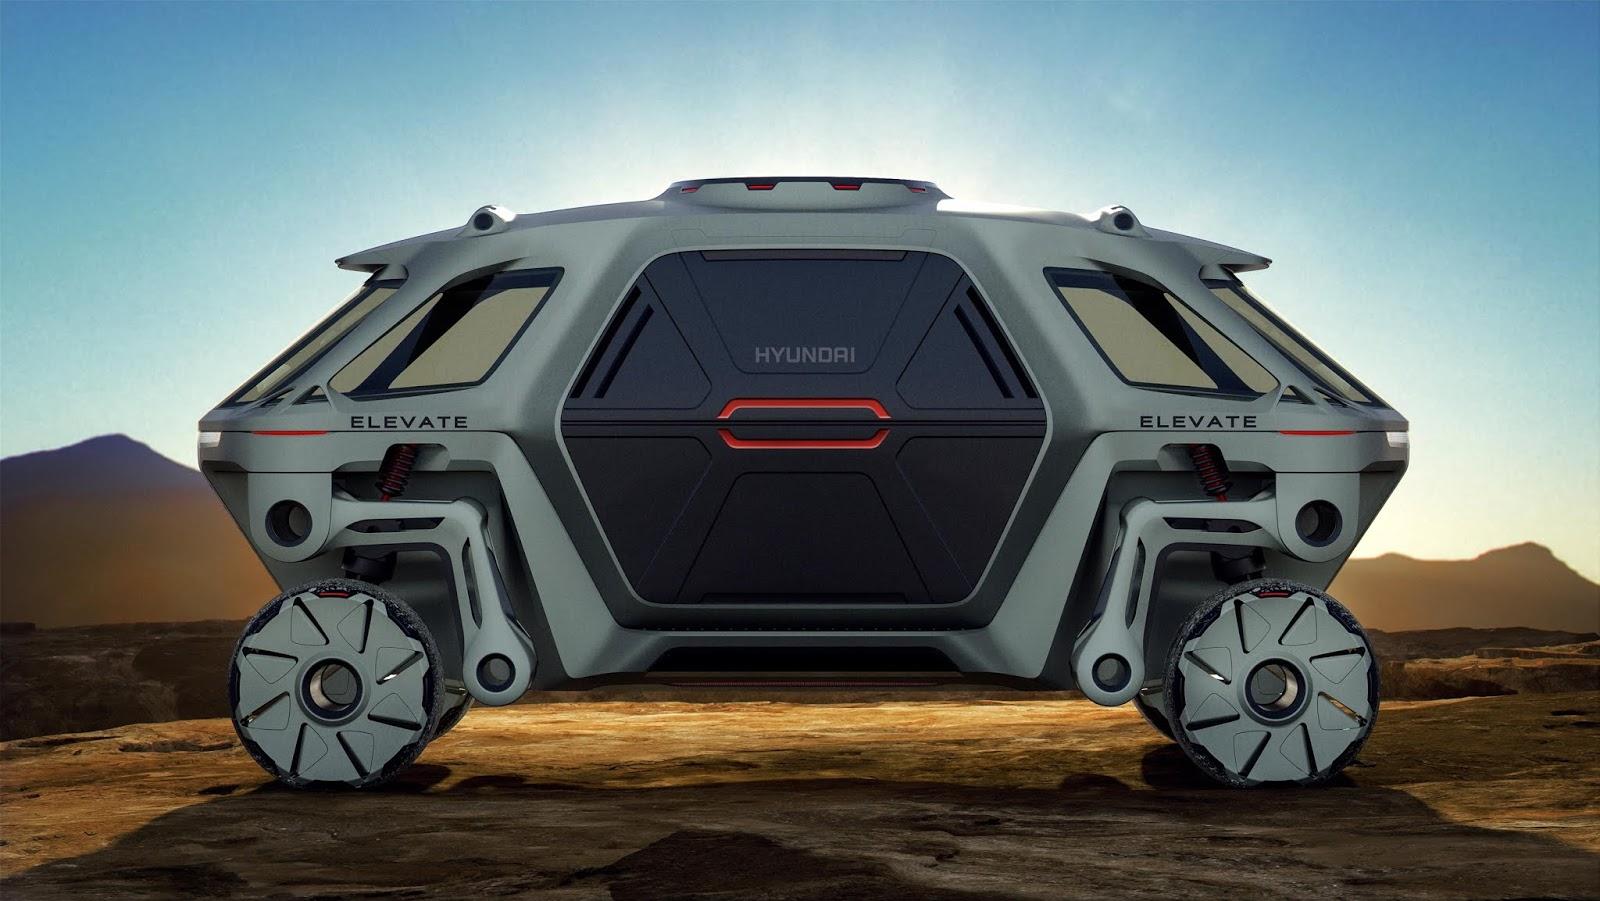 hyundai elevate concept252812529 H Hyundai έβγαλε όχημα με ρομποτικά πόδια! Electric cars, Hyundai, zblog, Τεχνολογία